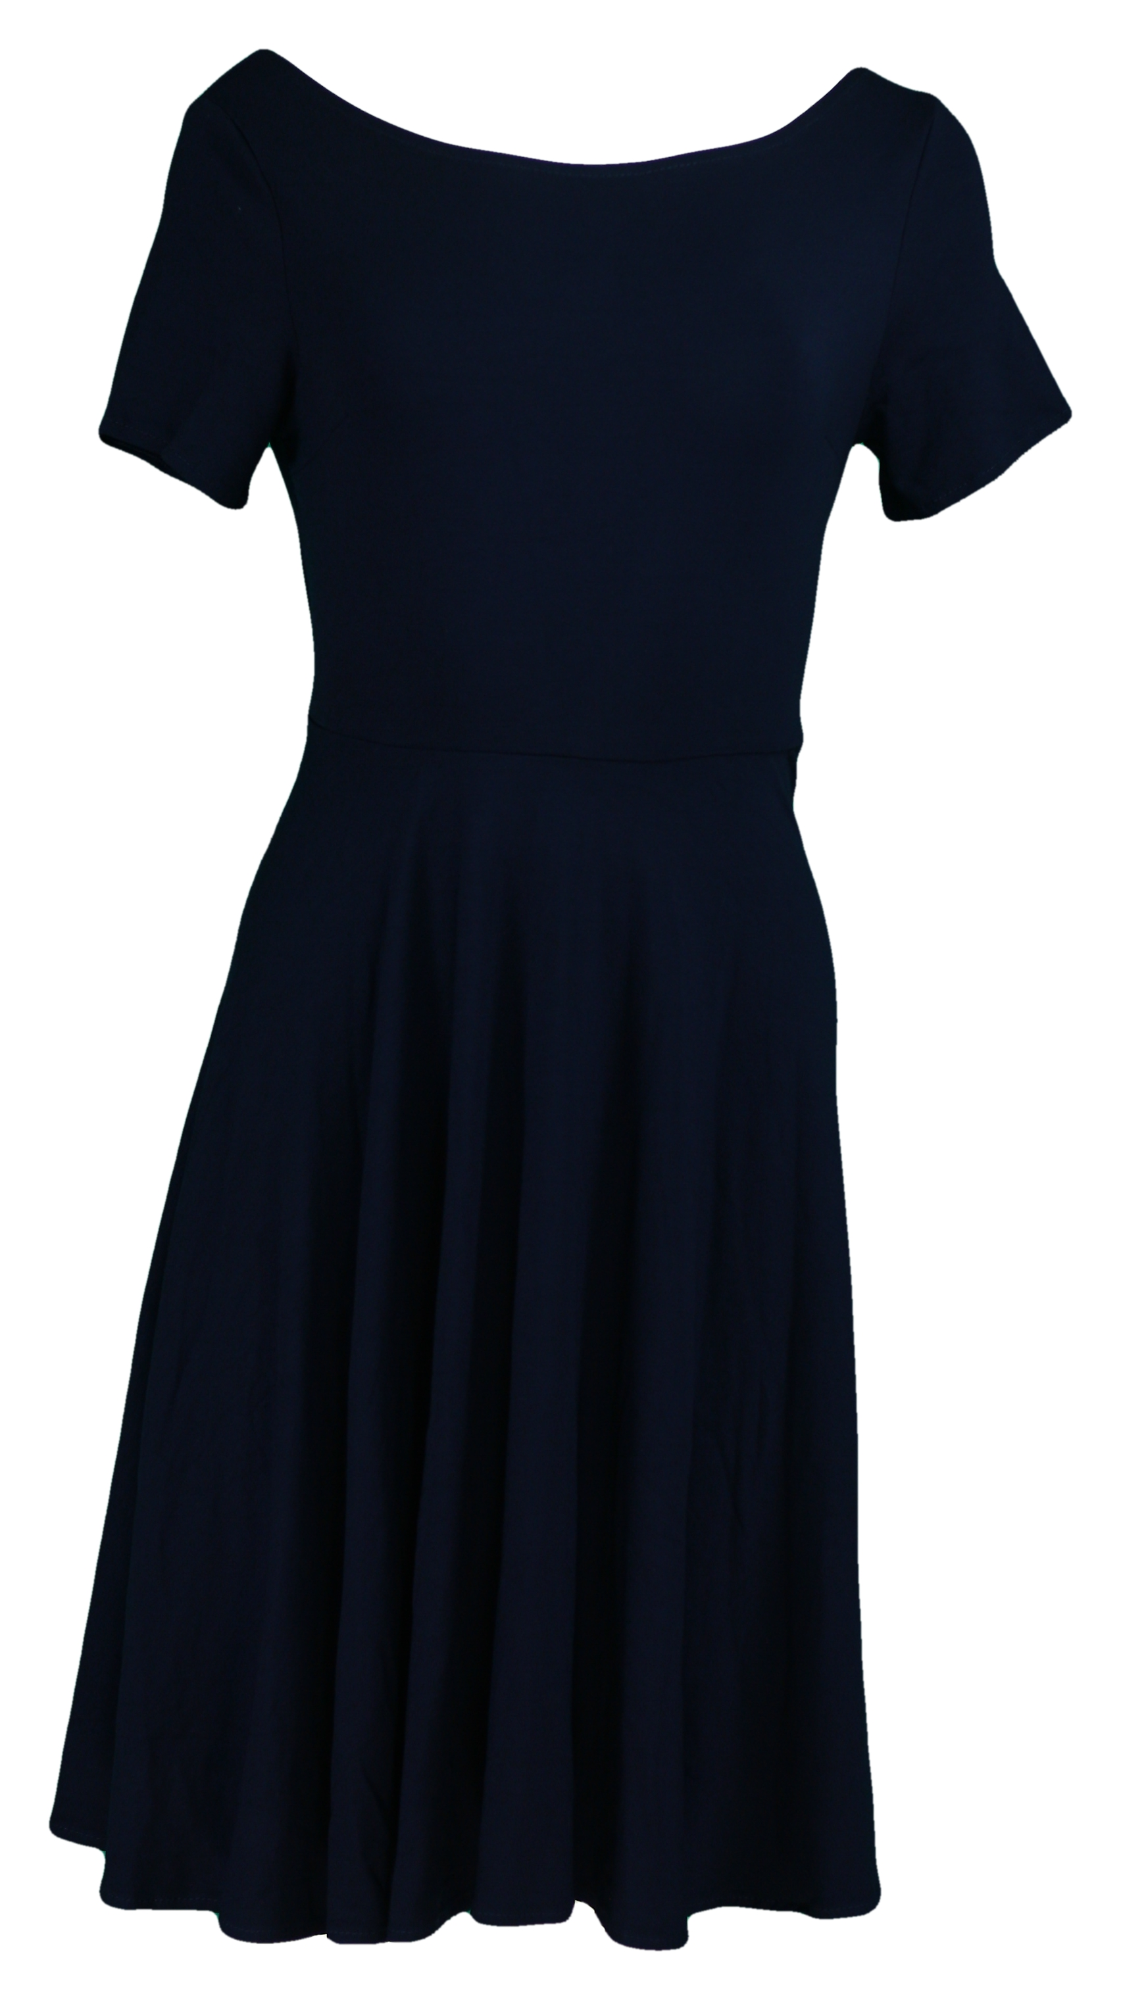 Dámske šaty Infinite - Gemini tm.modrá L